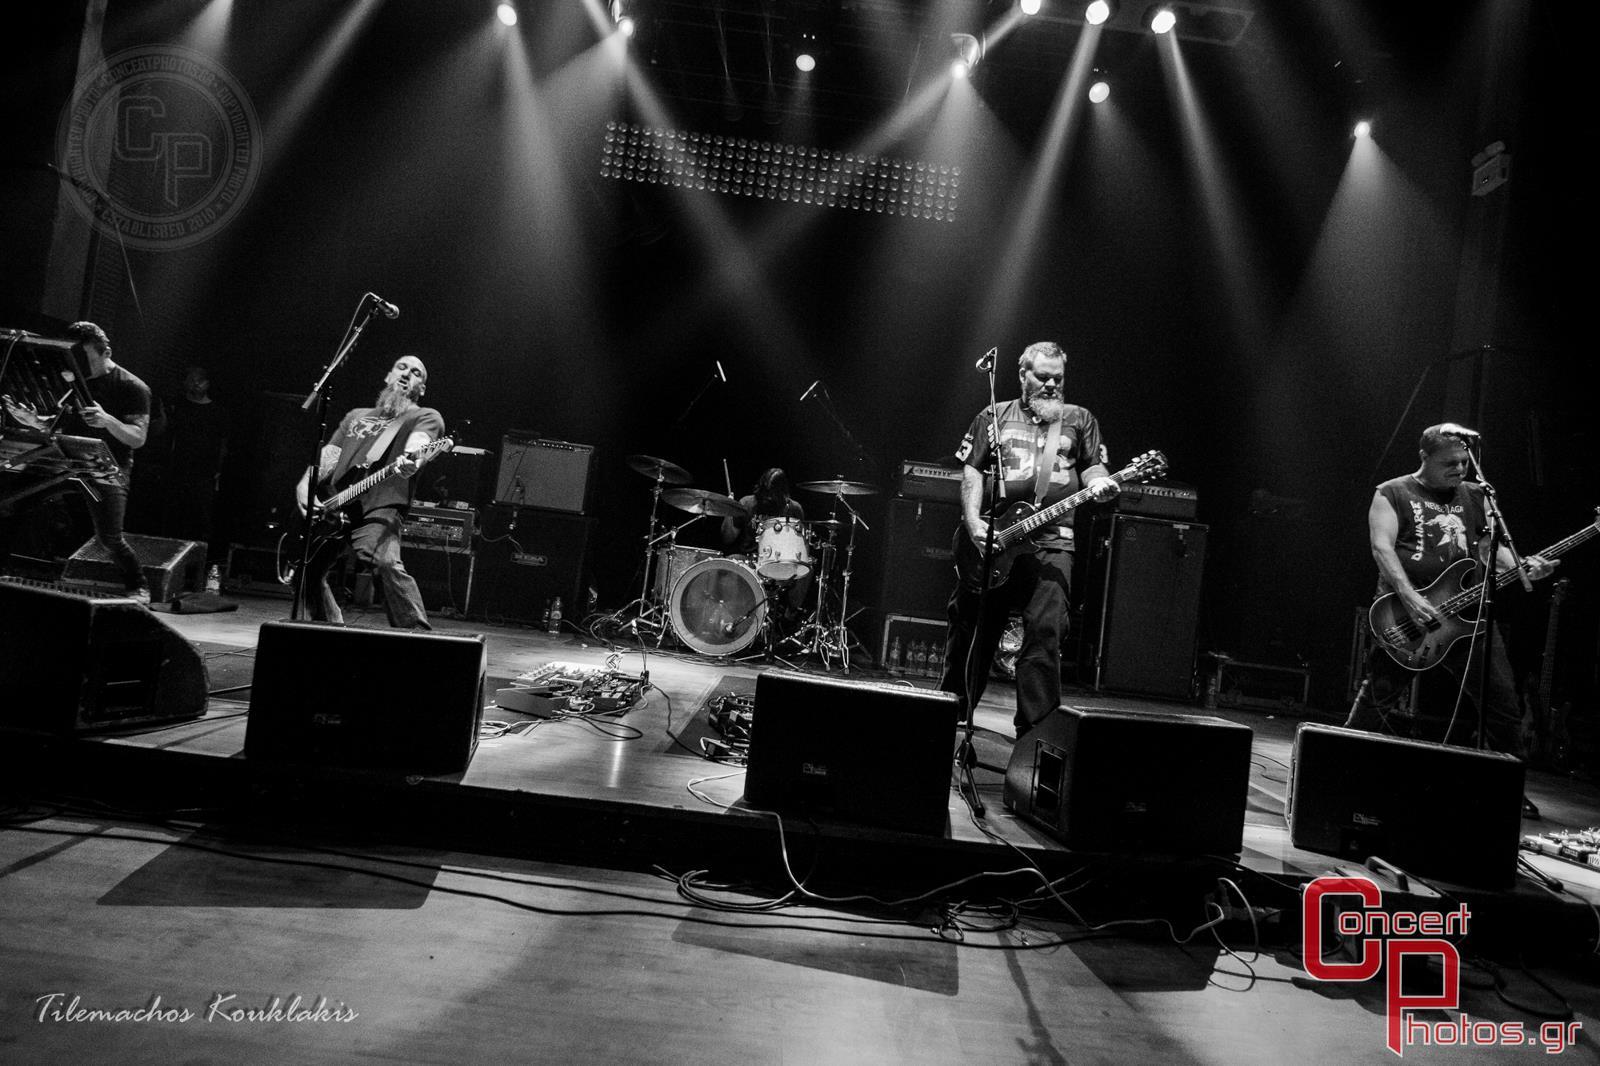 Neurosis-Neurosis photographer:  - concertphotos_20140707_23_56_33